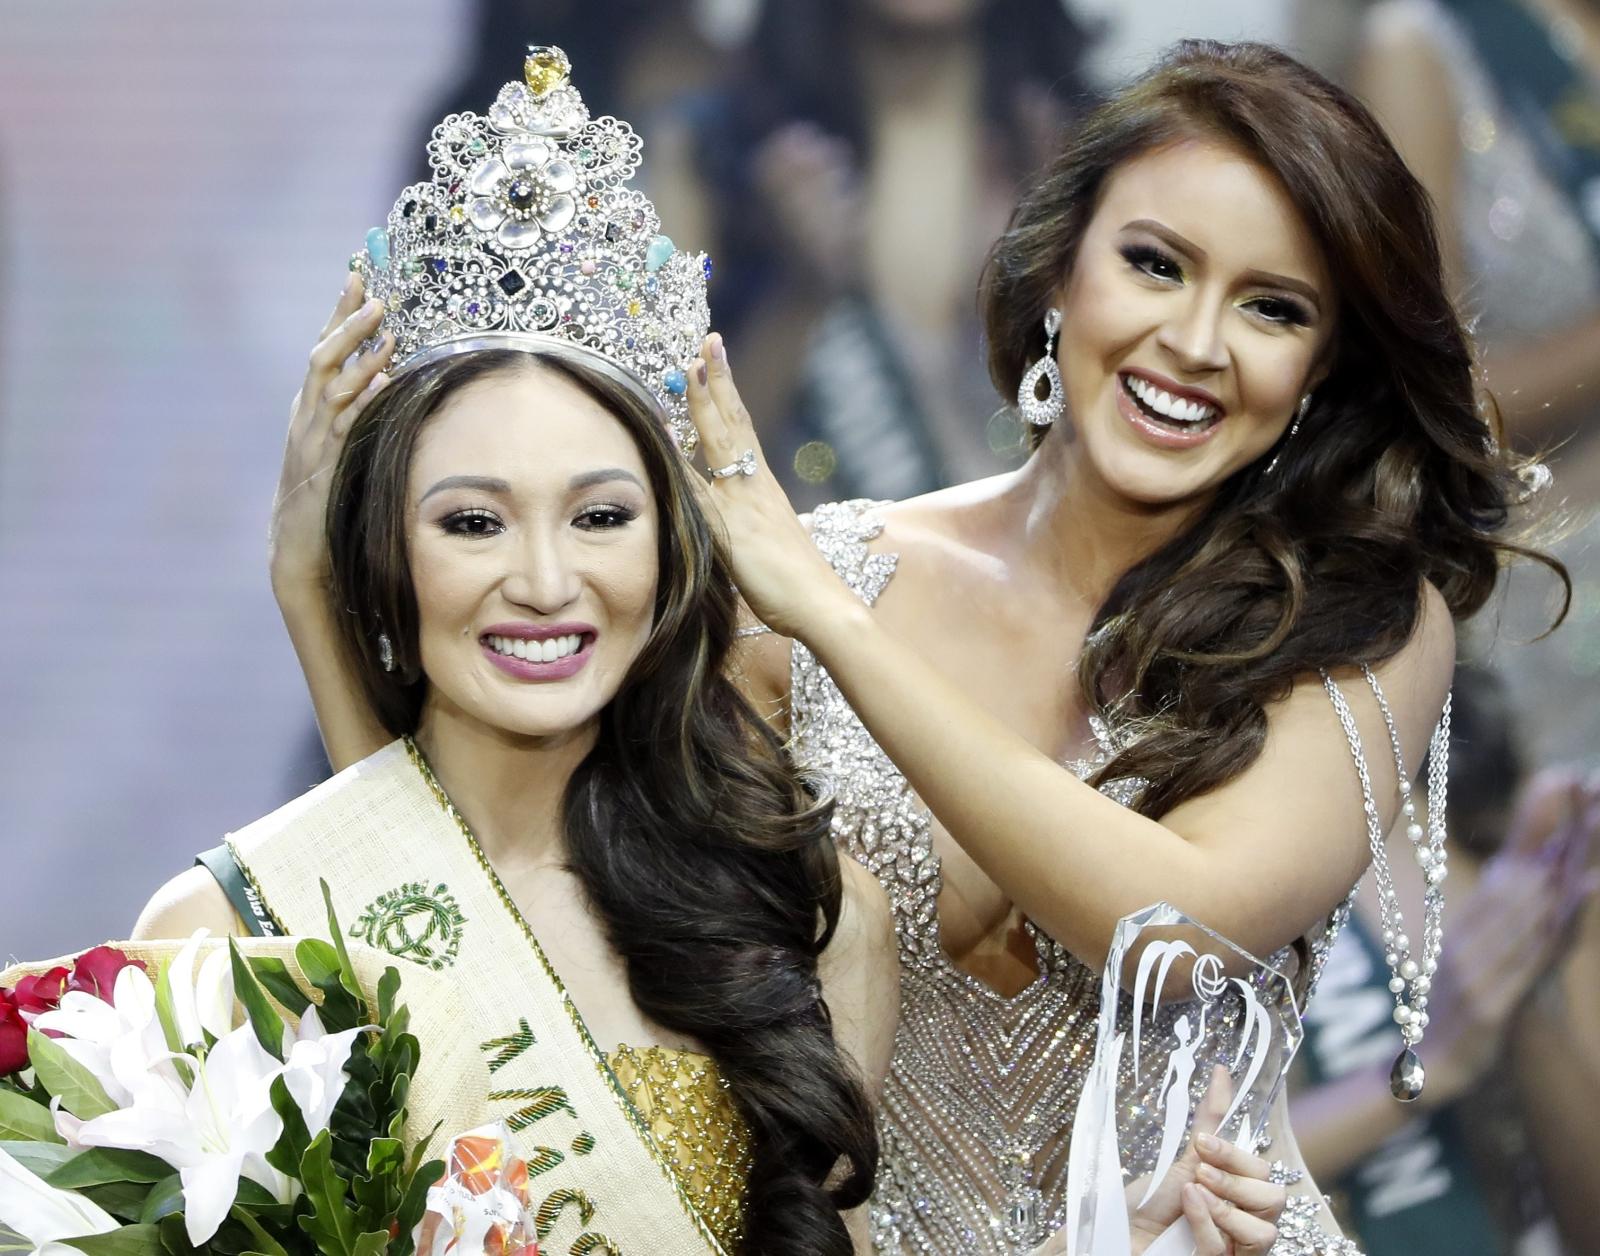 Miss Świata: Filipinka Karen Ibasco   EPA/FRANCIS R. MALASIG